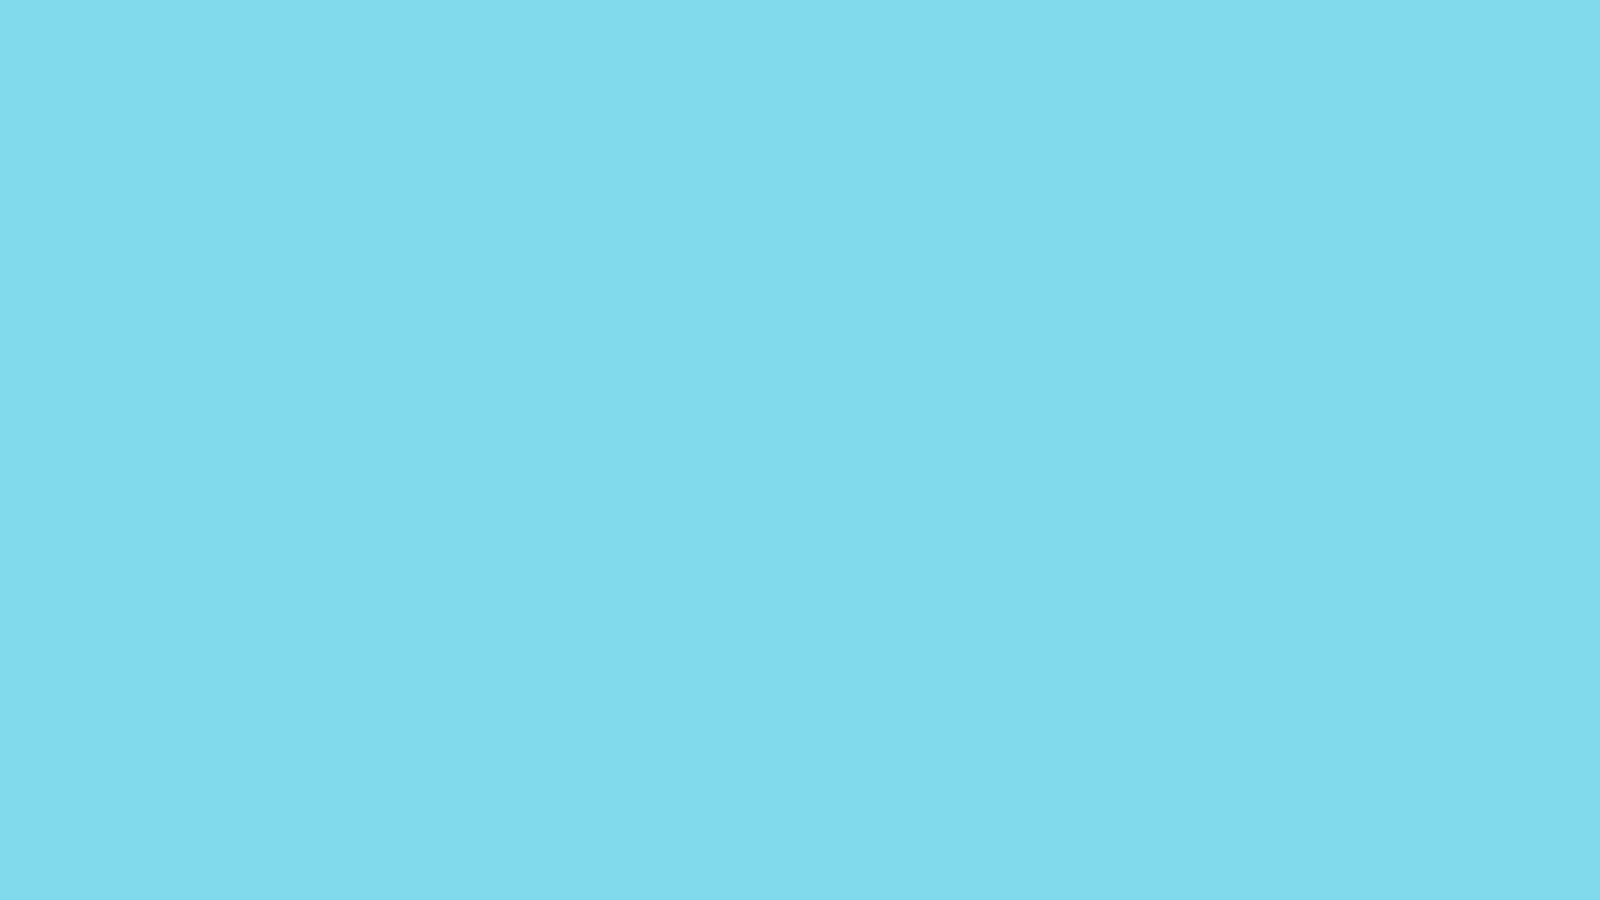 1600x900 Medium Sky Blue Solid Color Background